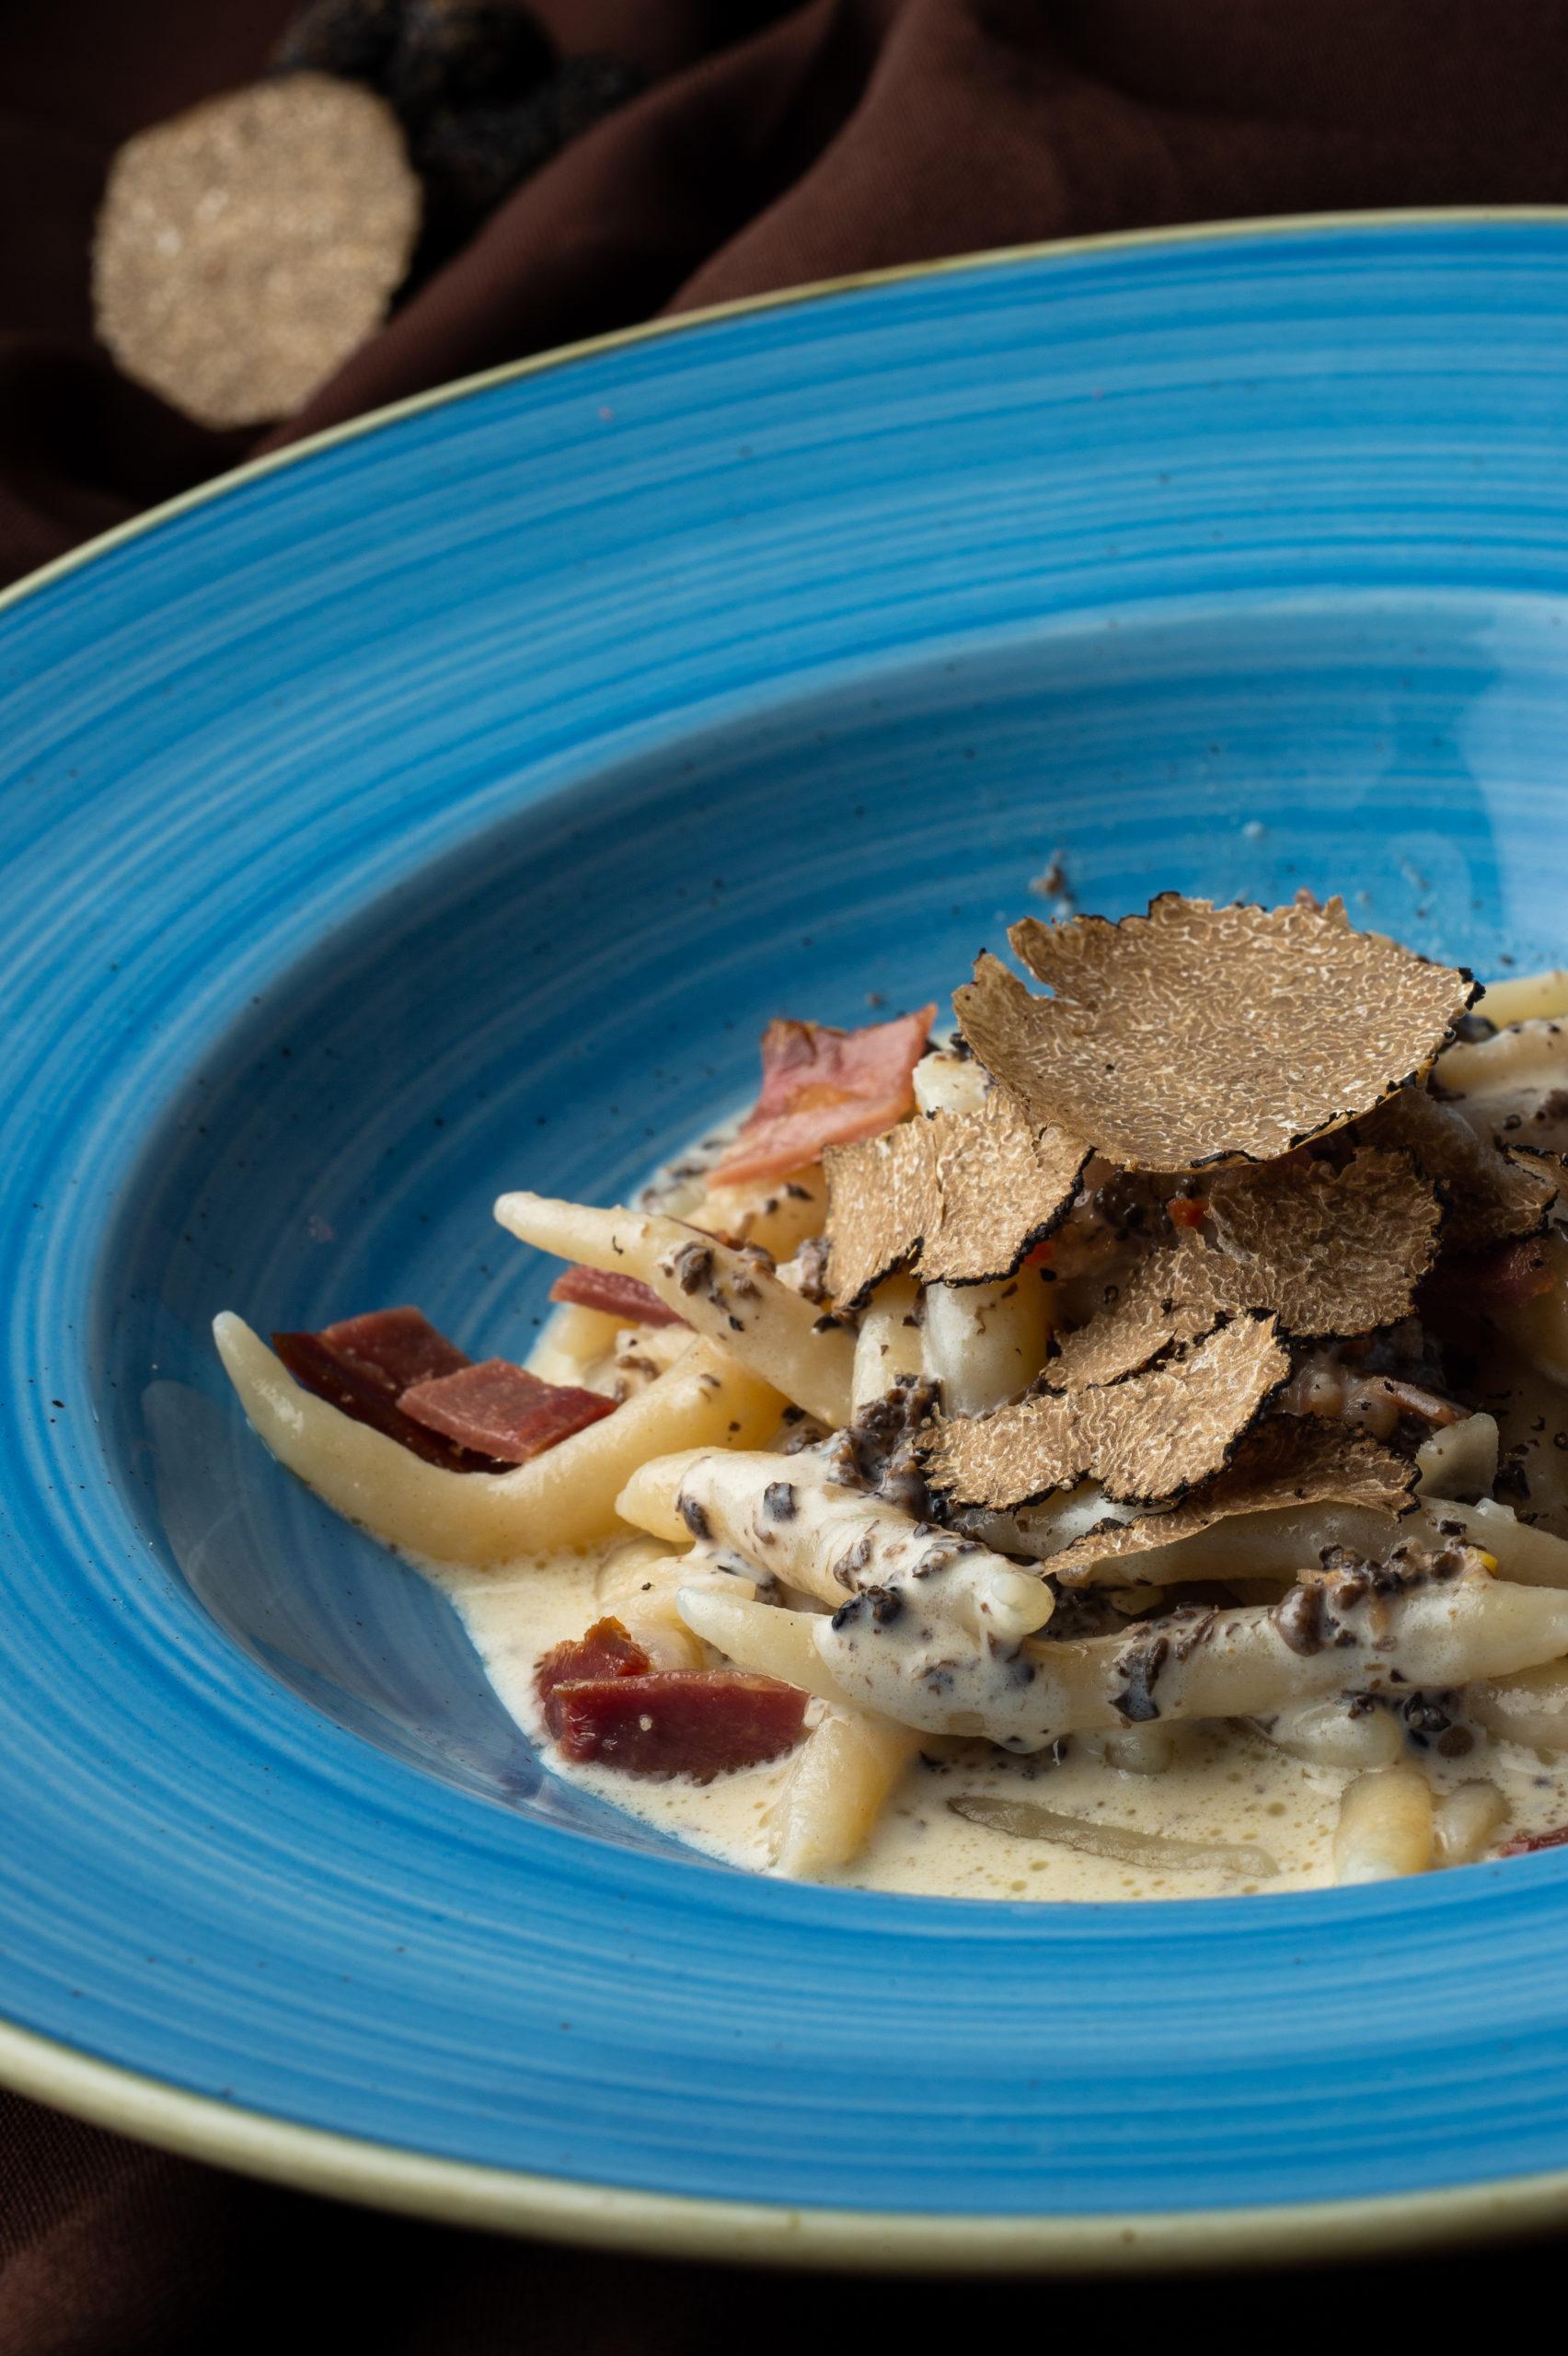 hren | plethora of creativity // Restaurant Konoba kod Luce food photography